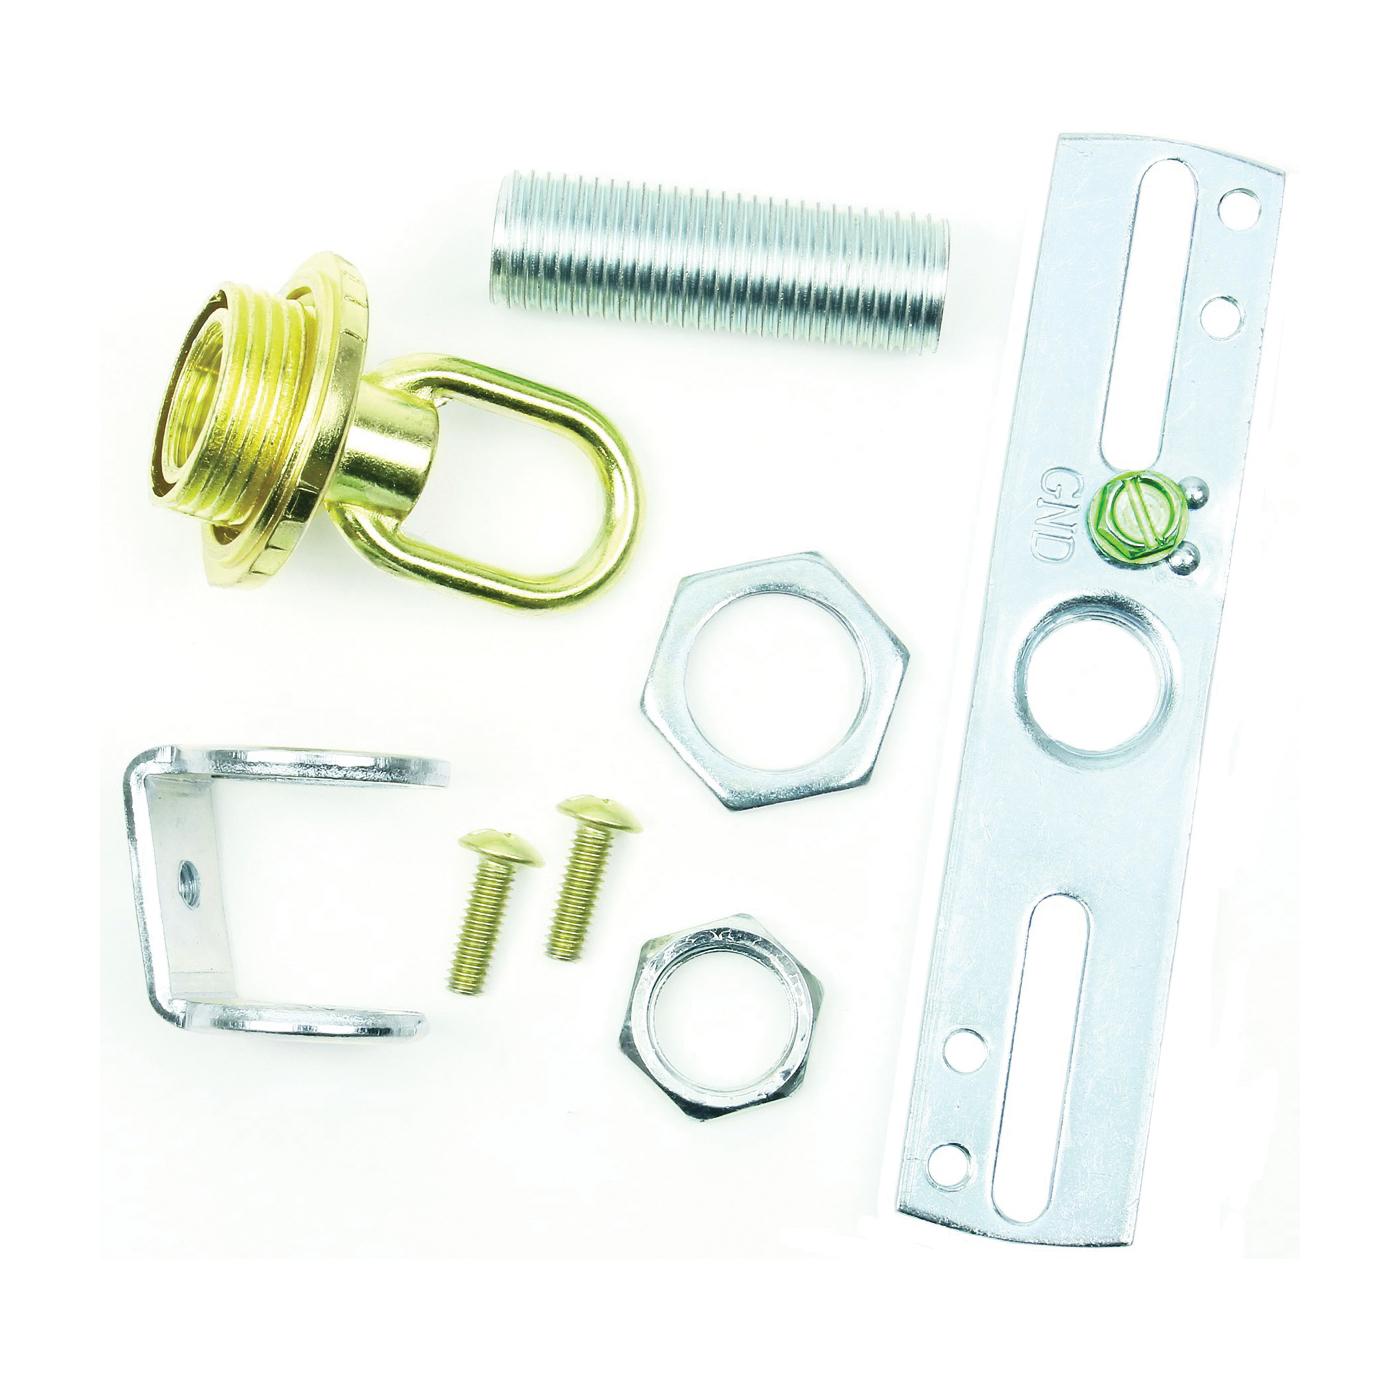 Picture of Jandorf 60206 Loop Crossbar Kit, Screw Collar, Brass